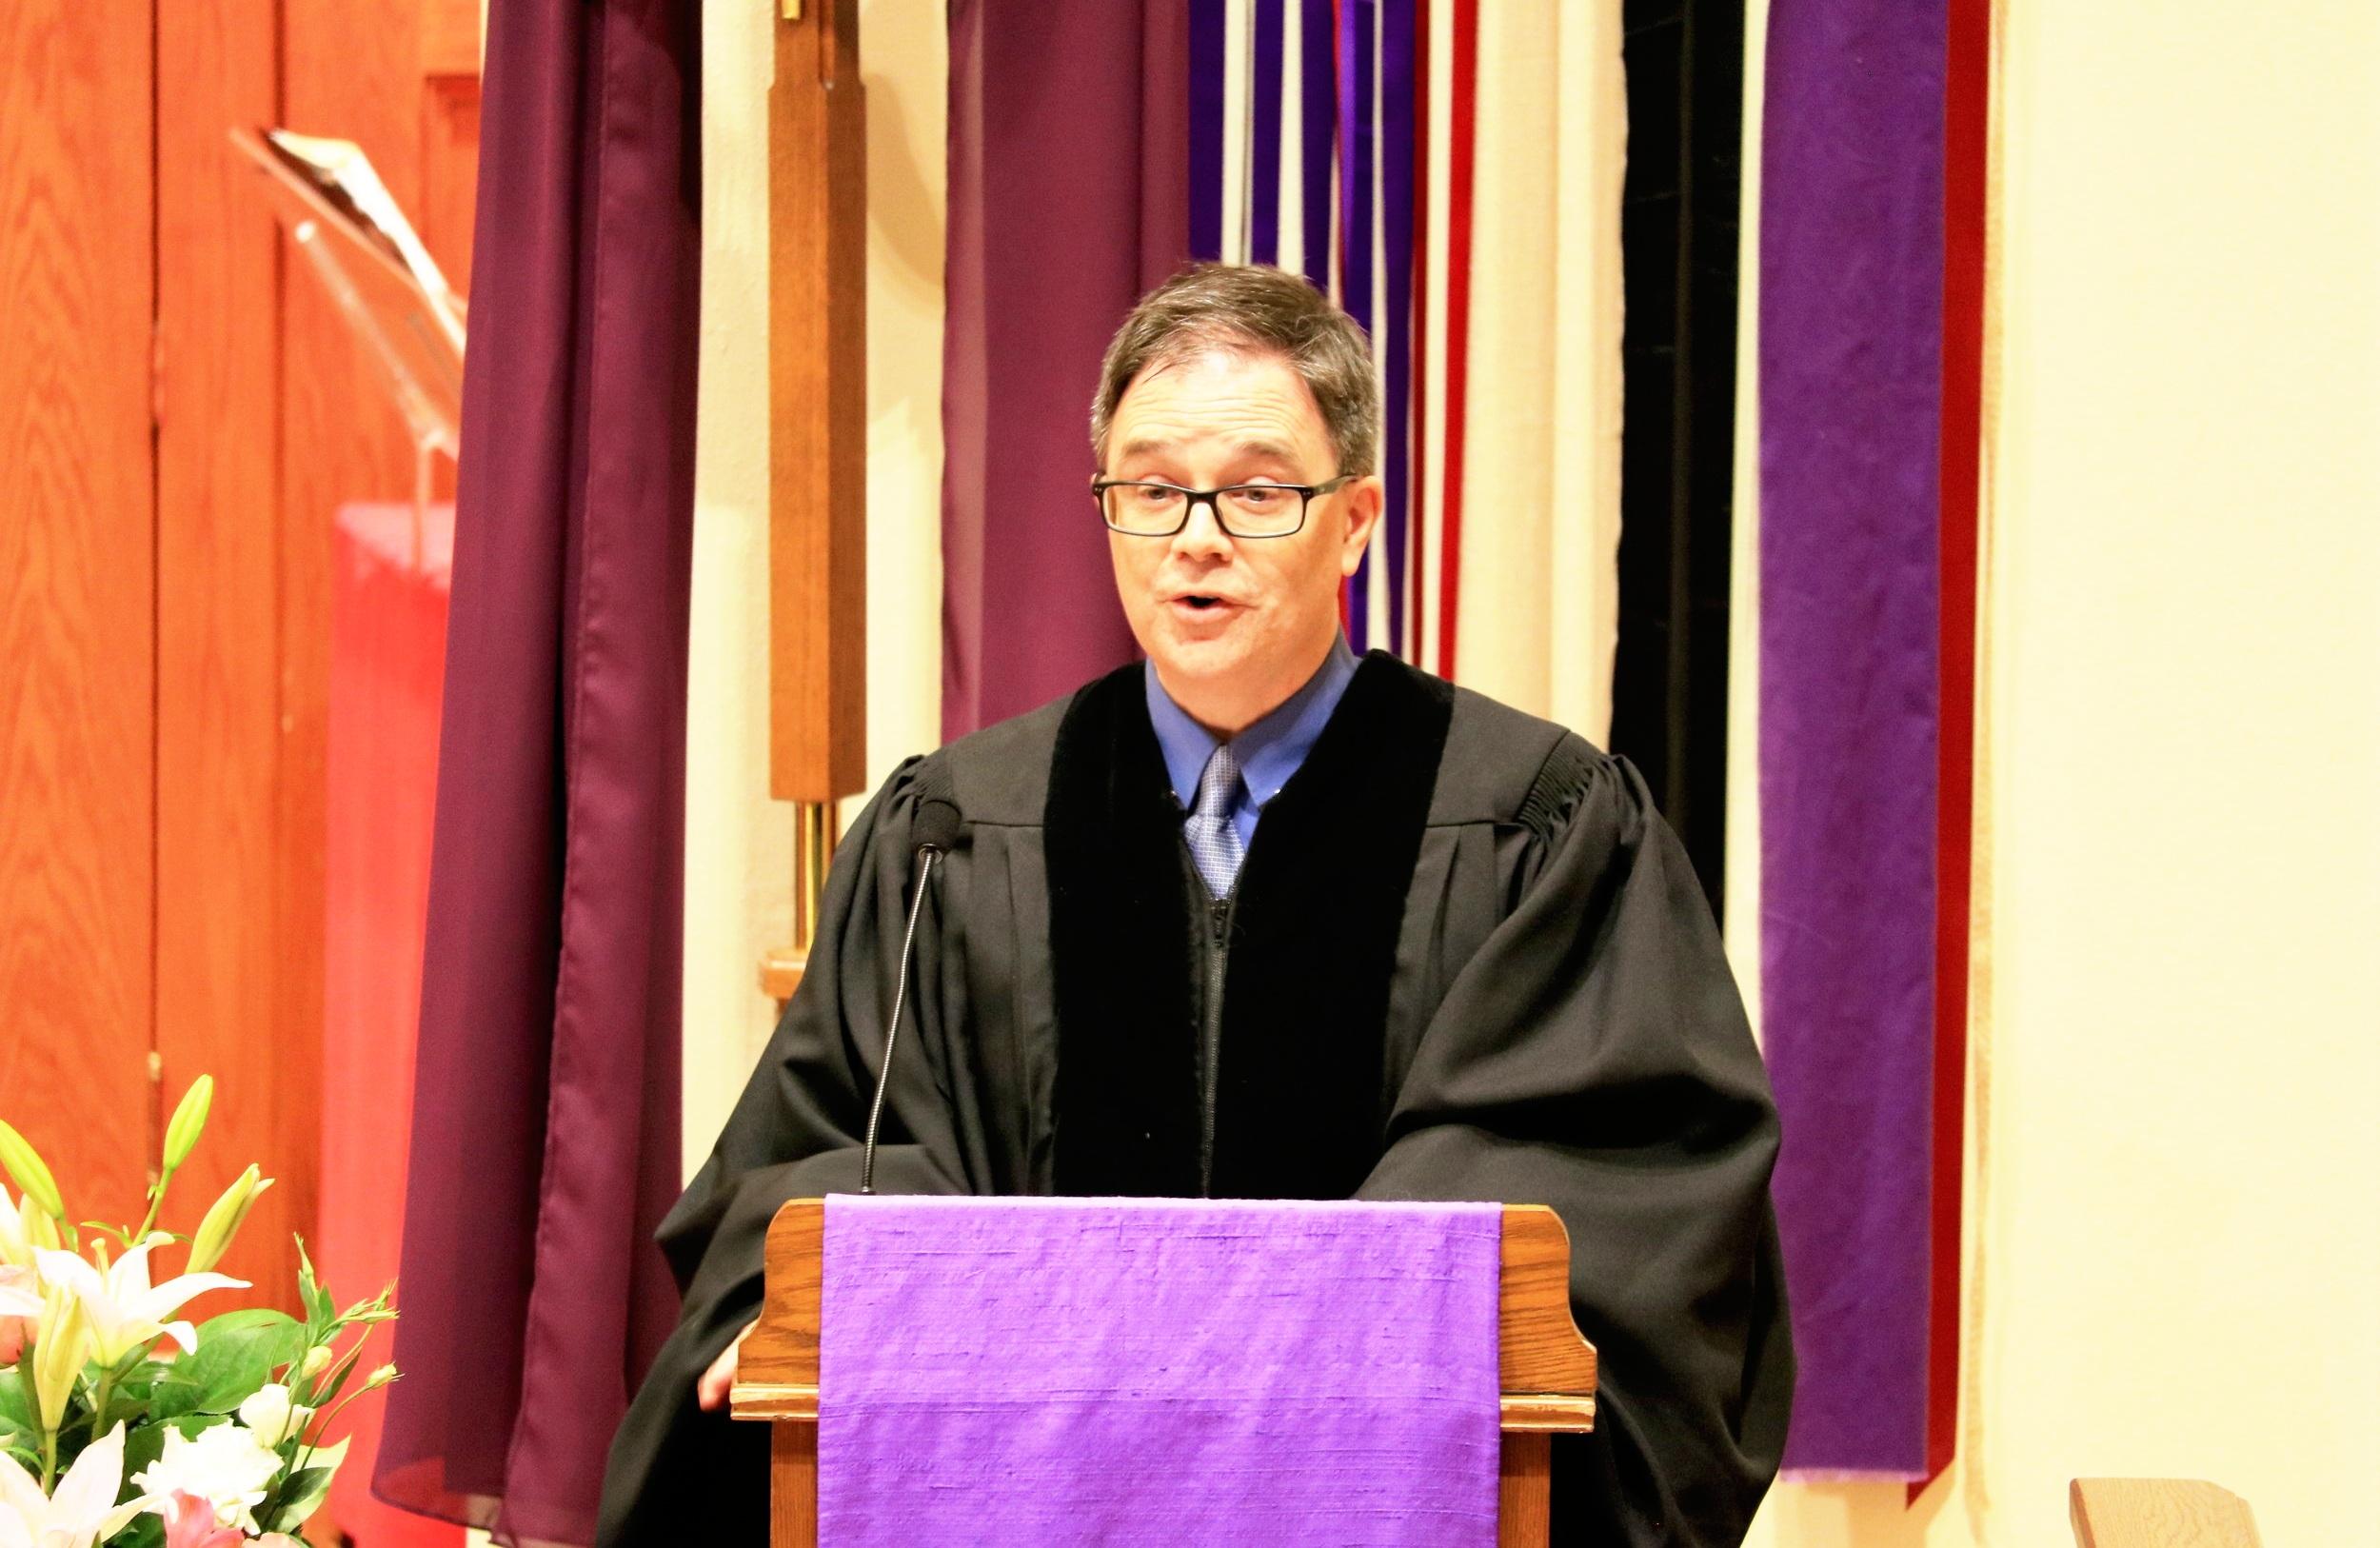 Jay Rowland preaching.JPG